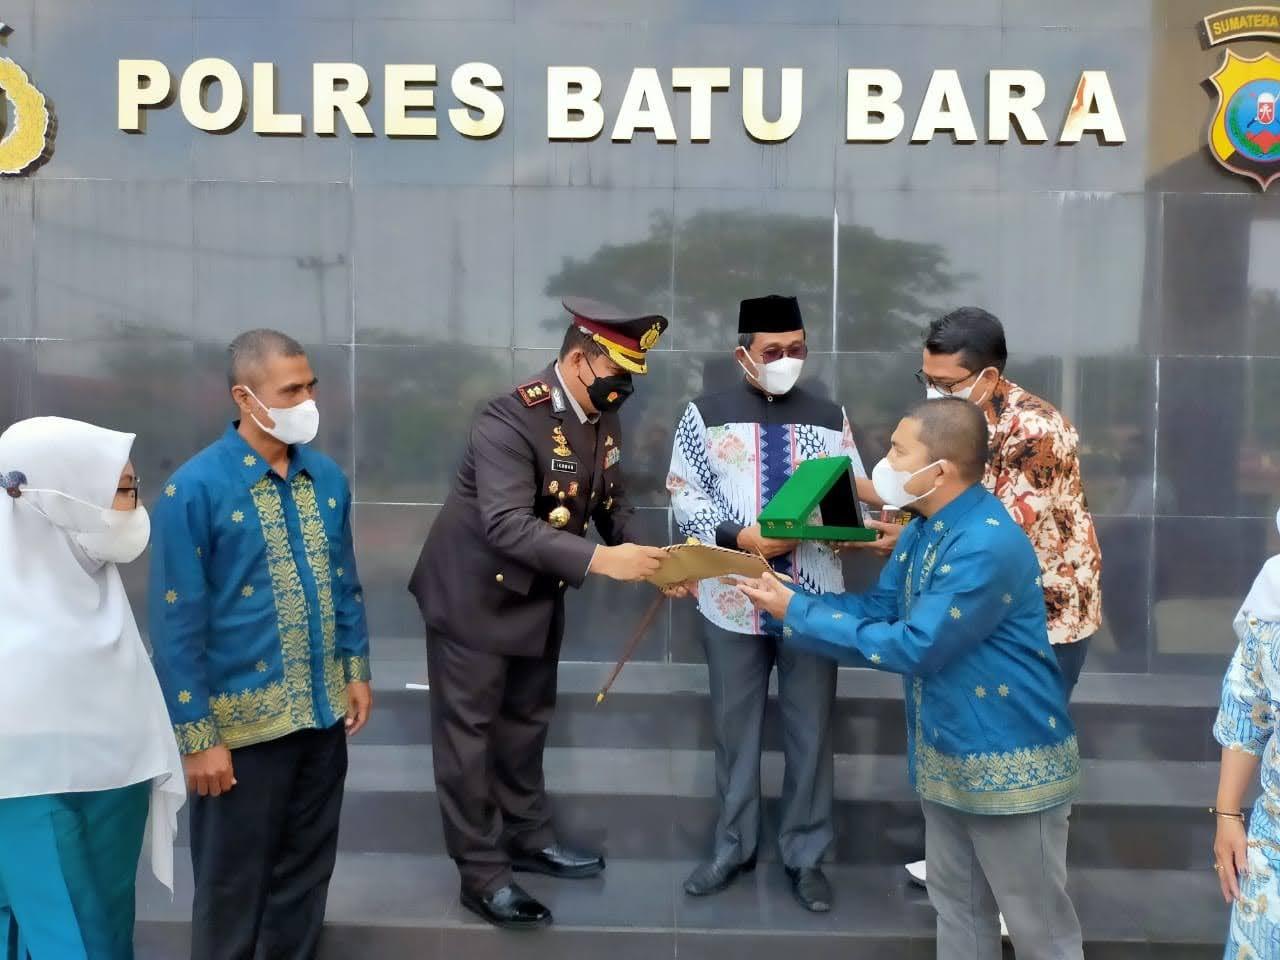 HIKABARA Memberikan Penghargaan dan Dukungan Atas Kerja Baik Kapolres Batu Bara